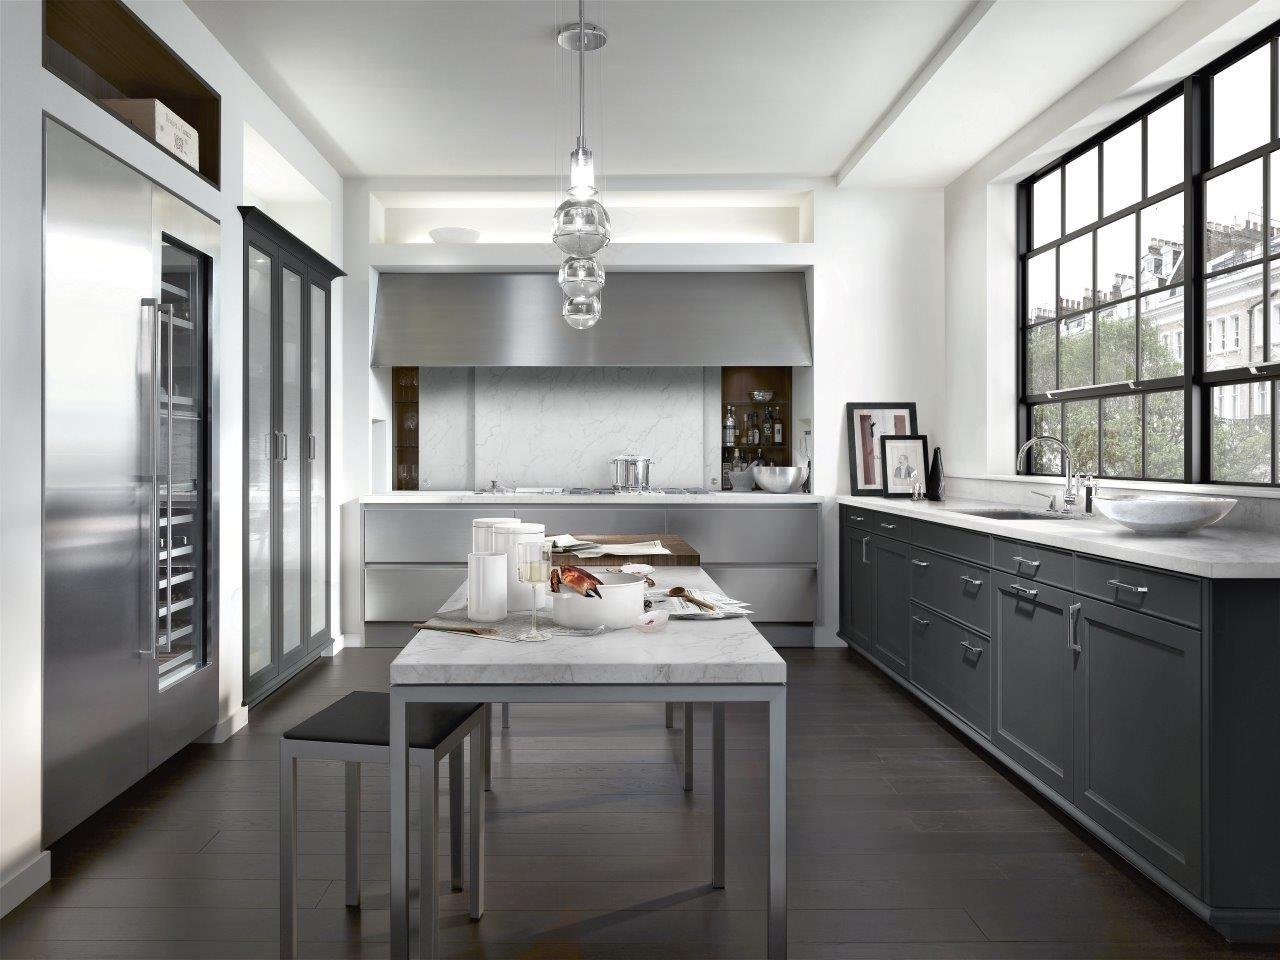 Beaux Arts Interior Design Plans siematic classic / beauxarts + s2 the siematic beauxarts planning